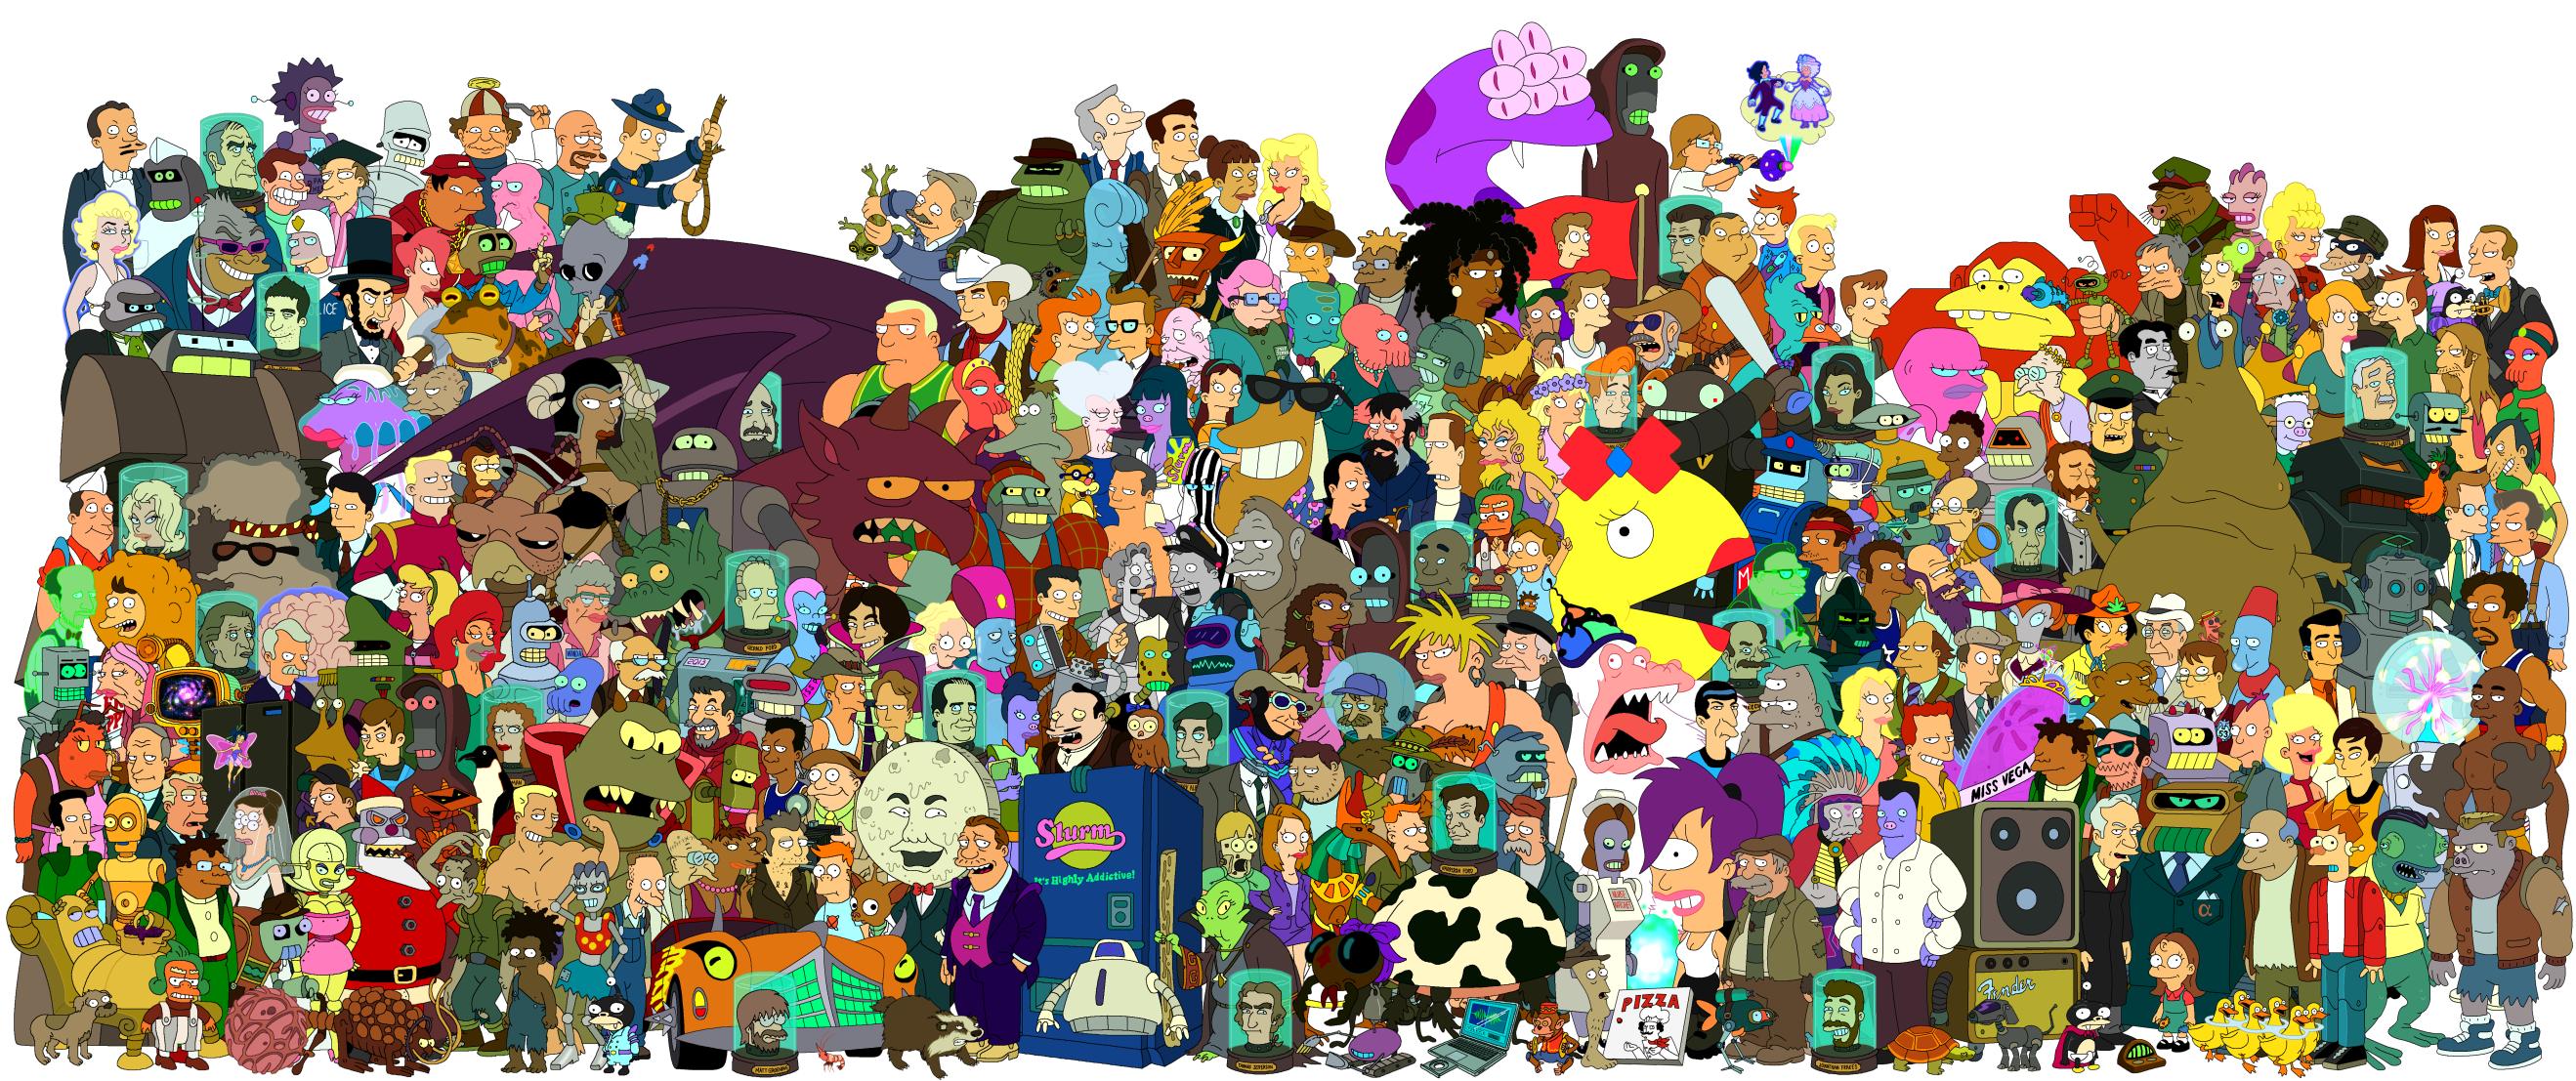 Futurama Full HD Wallpaper and Background Image 2637x1107